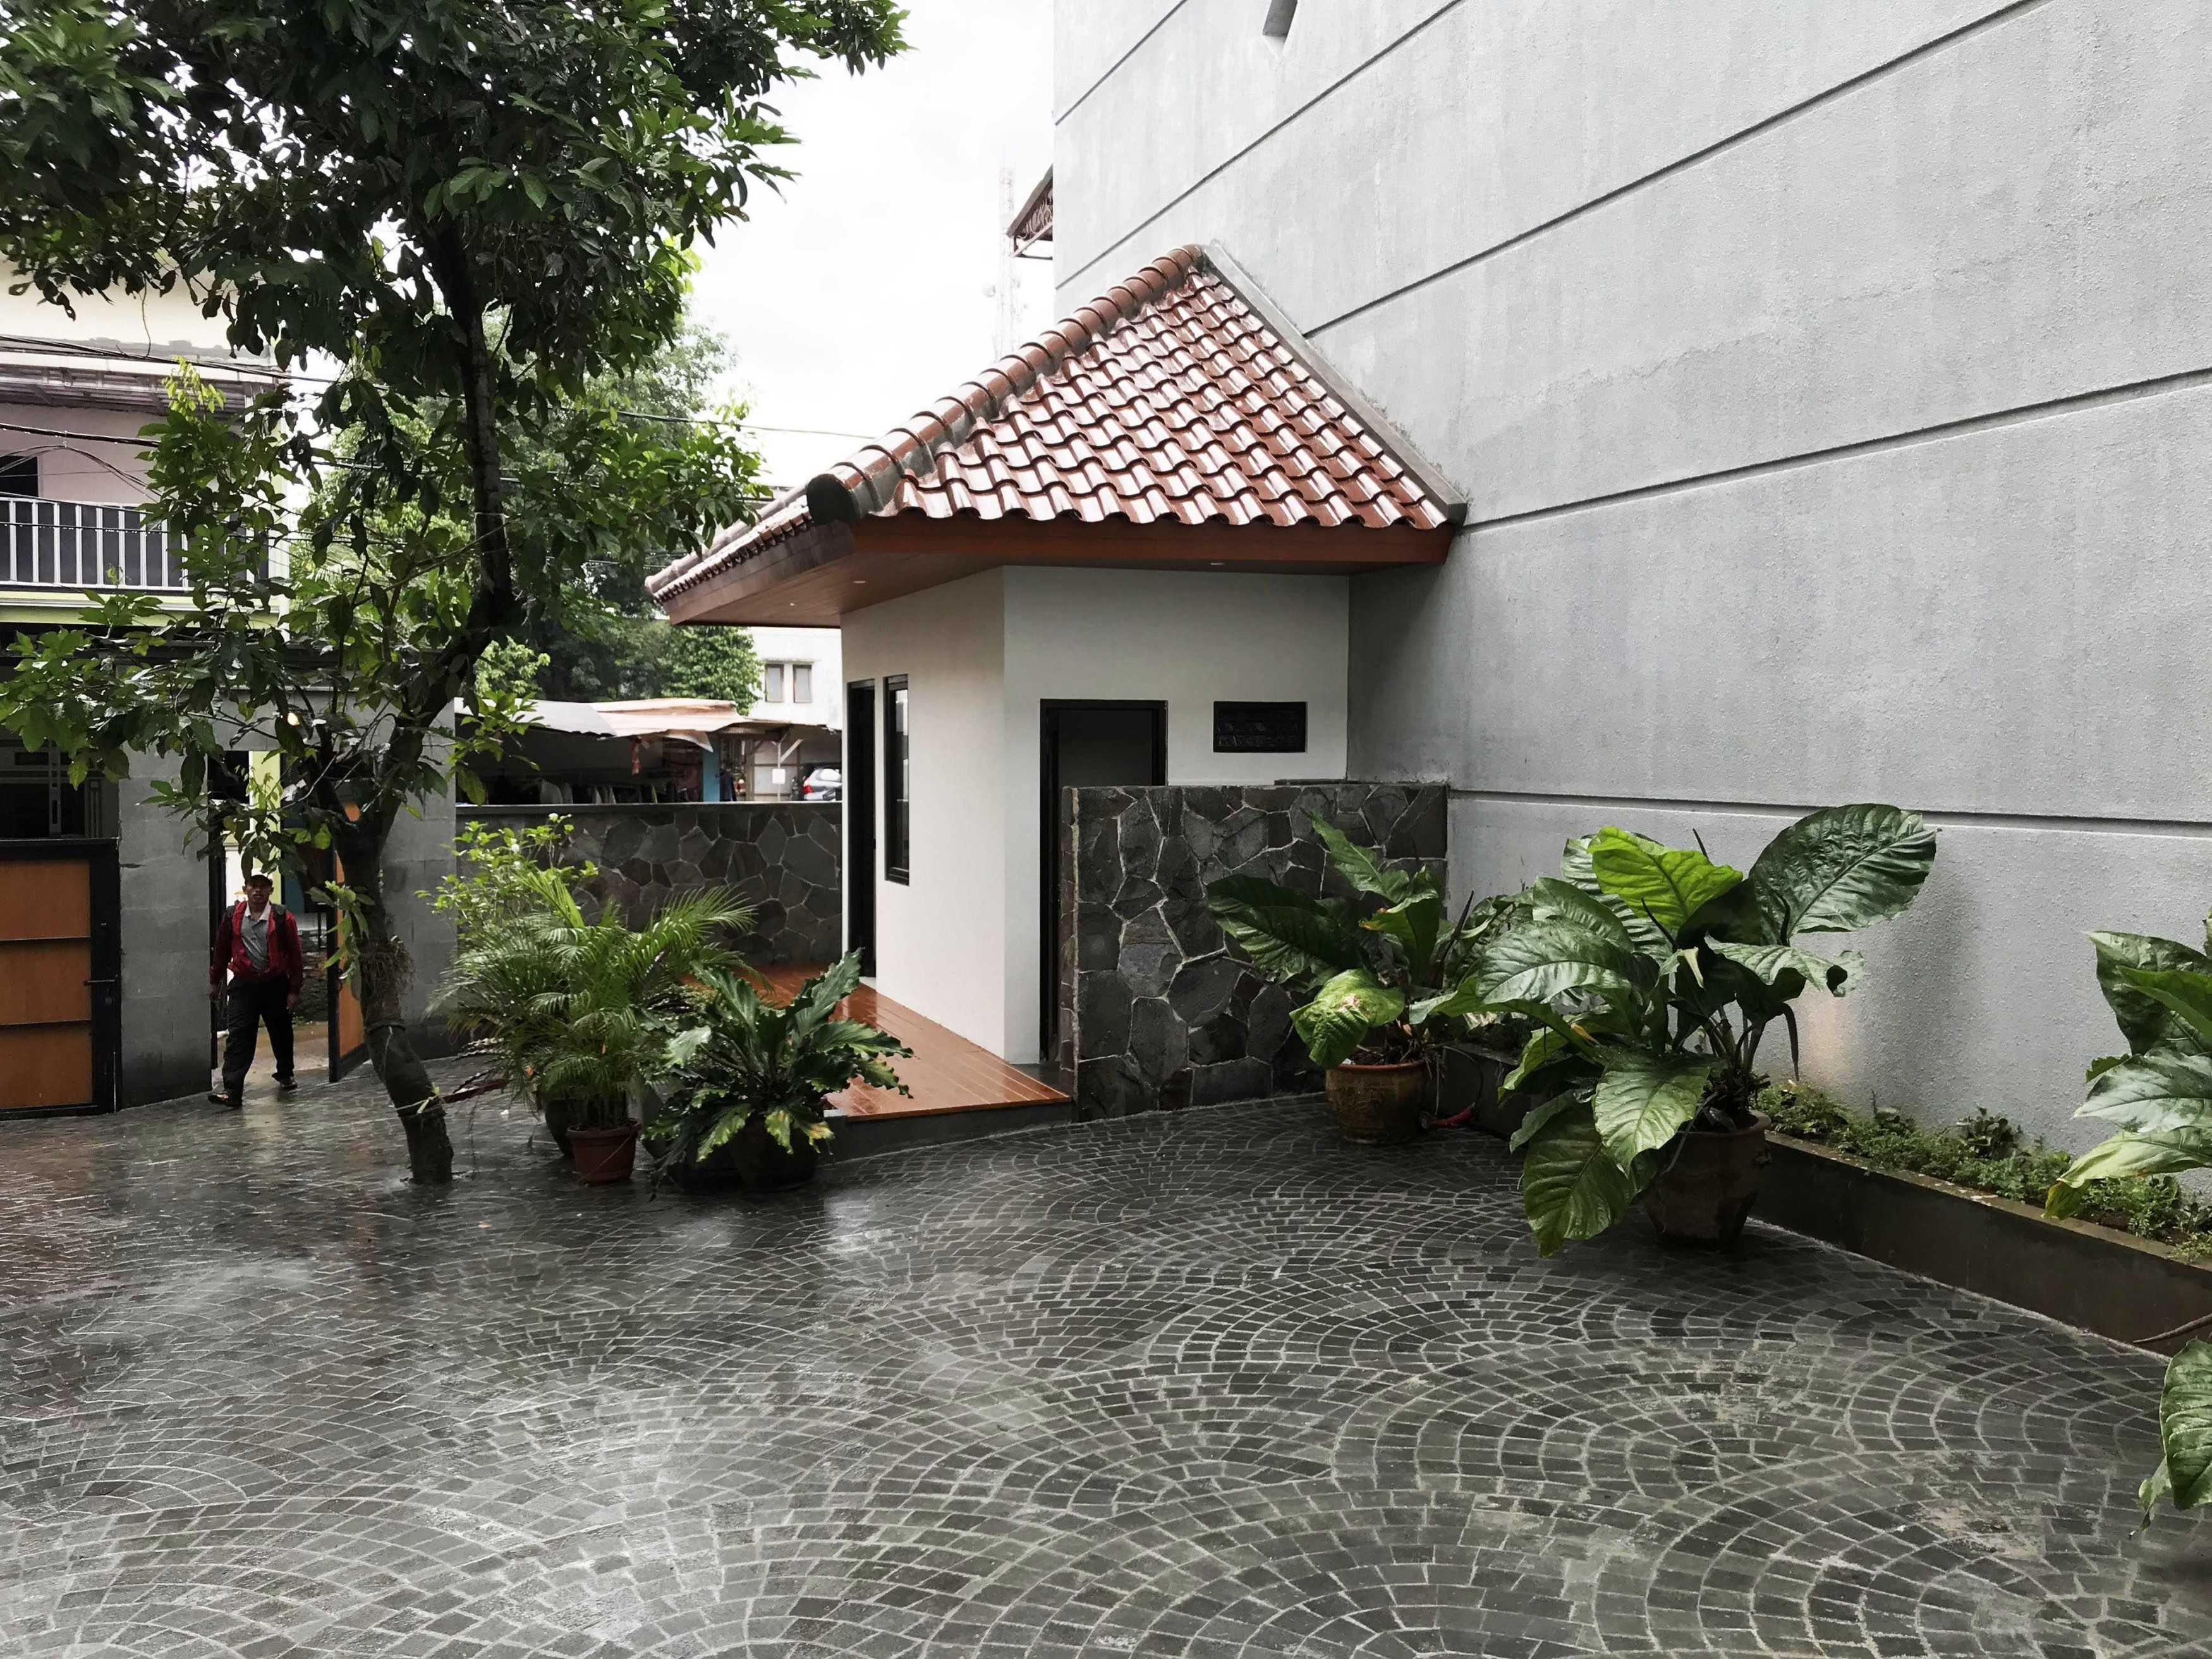 Jw Consultant J House - Renovation Pancoran, Kota Jakarta Selatan, Daerah Khusus Ibukota Jakarta, Indonesia Pancoran, Kota Jakarta Selatan, Daerah Khusus Ibukota Jakarta, Indonesia Jw-Consultant-J-House   61830